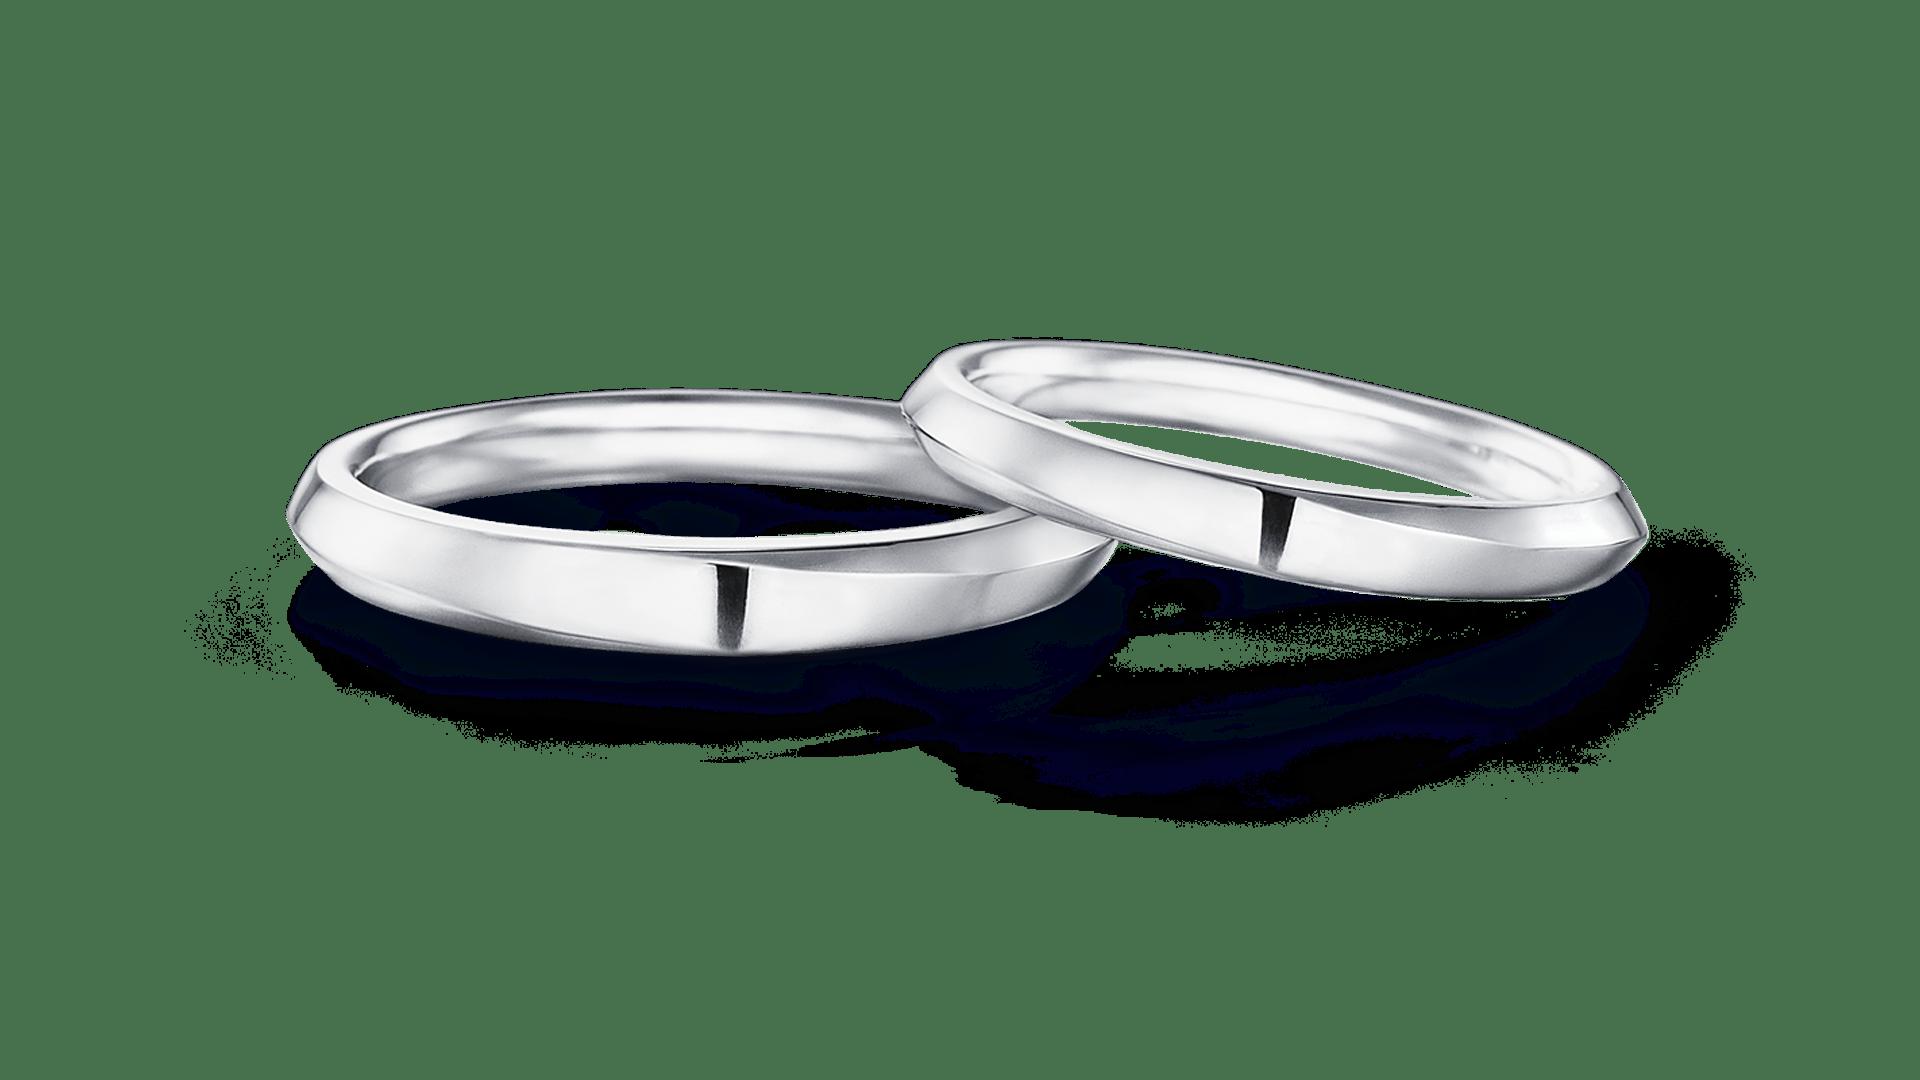 penelope plain ペネロープ プレーン | 結婚指輪サムネイル 1